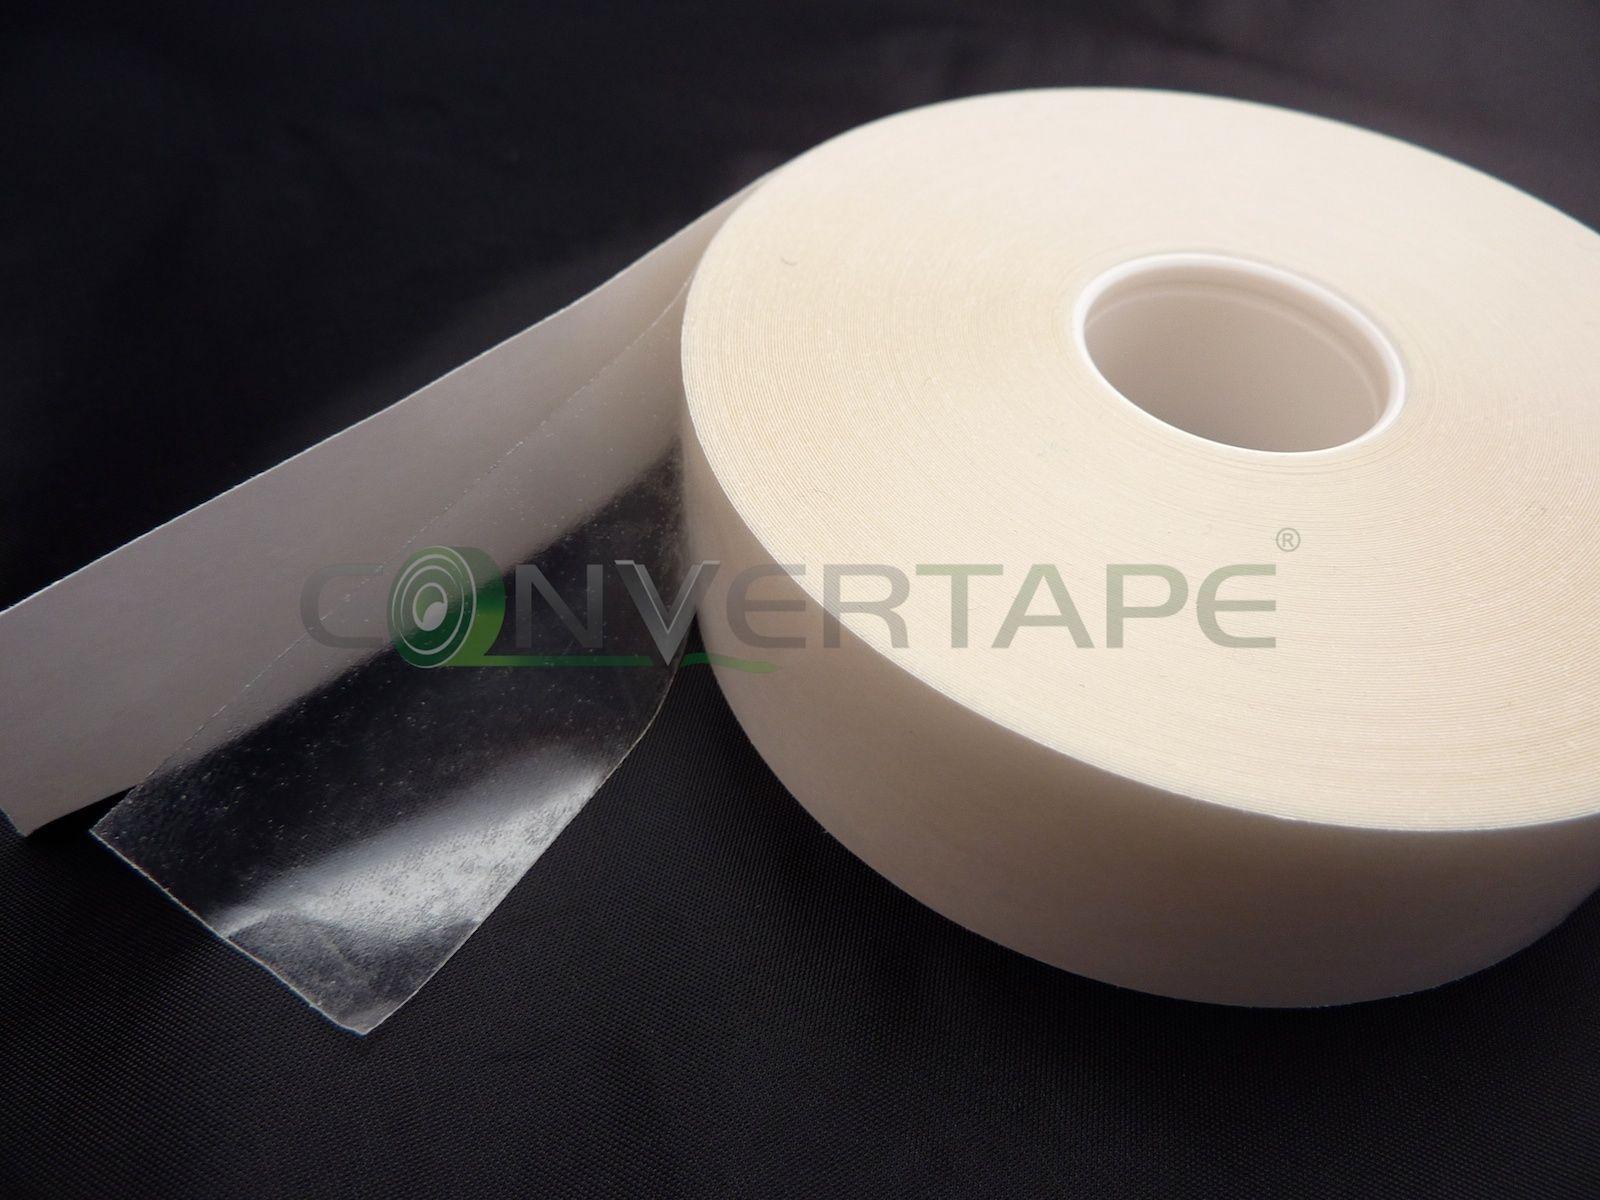 95c786f41a6 Double Sided Fashion Modesty Tape Tit Toupee Boob Wig Clear Dress Body  Secret